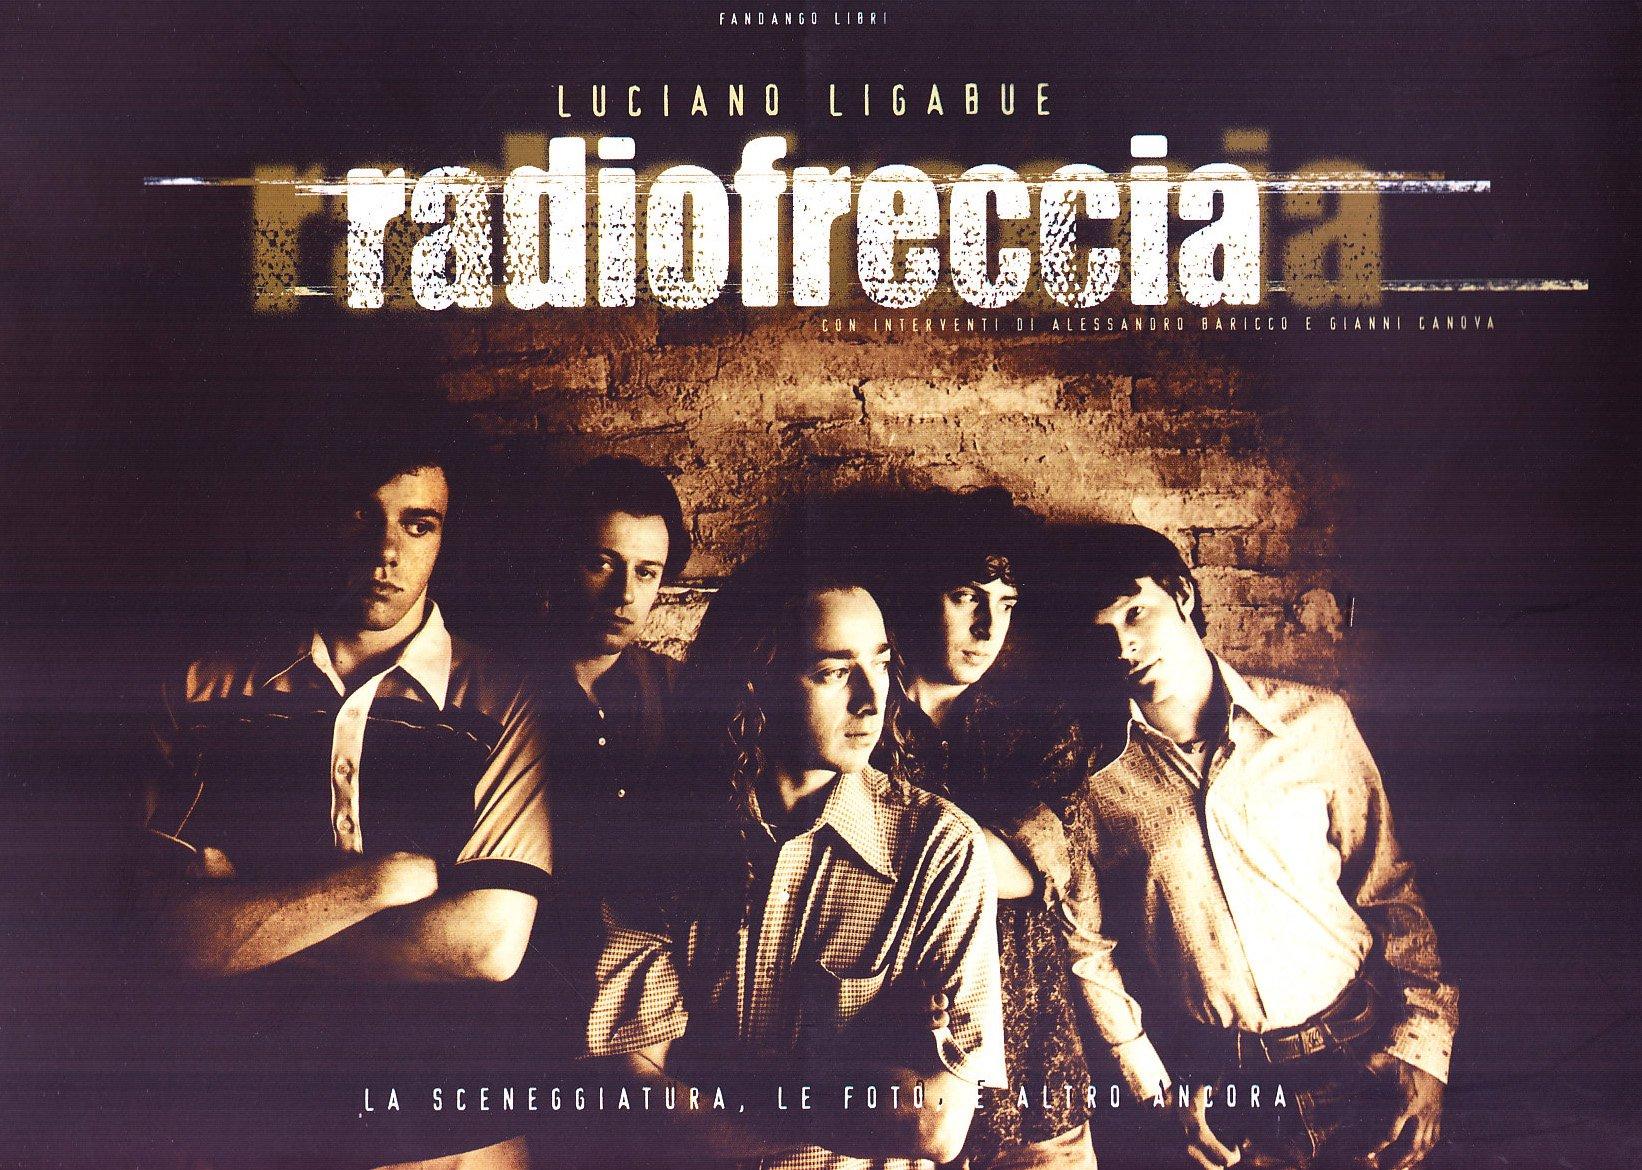 04.radiofreccia di luciano ligabue.cover facebook